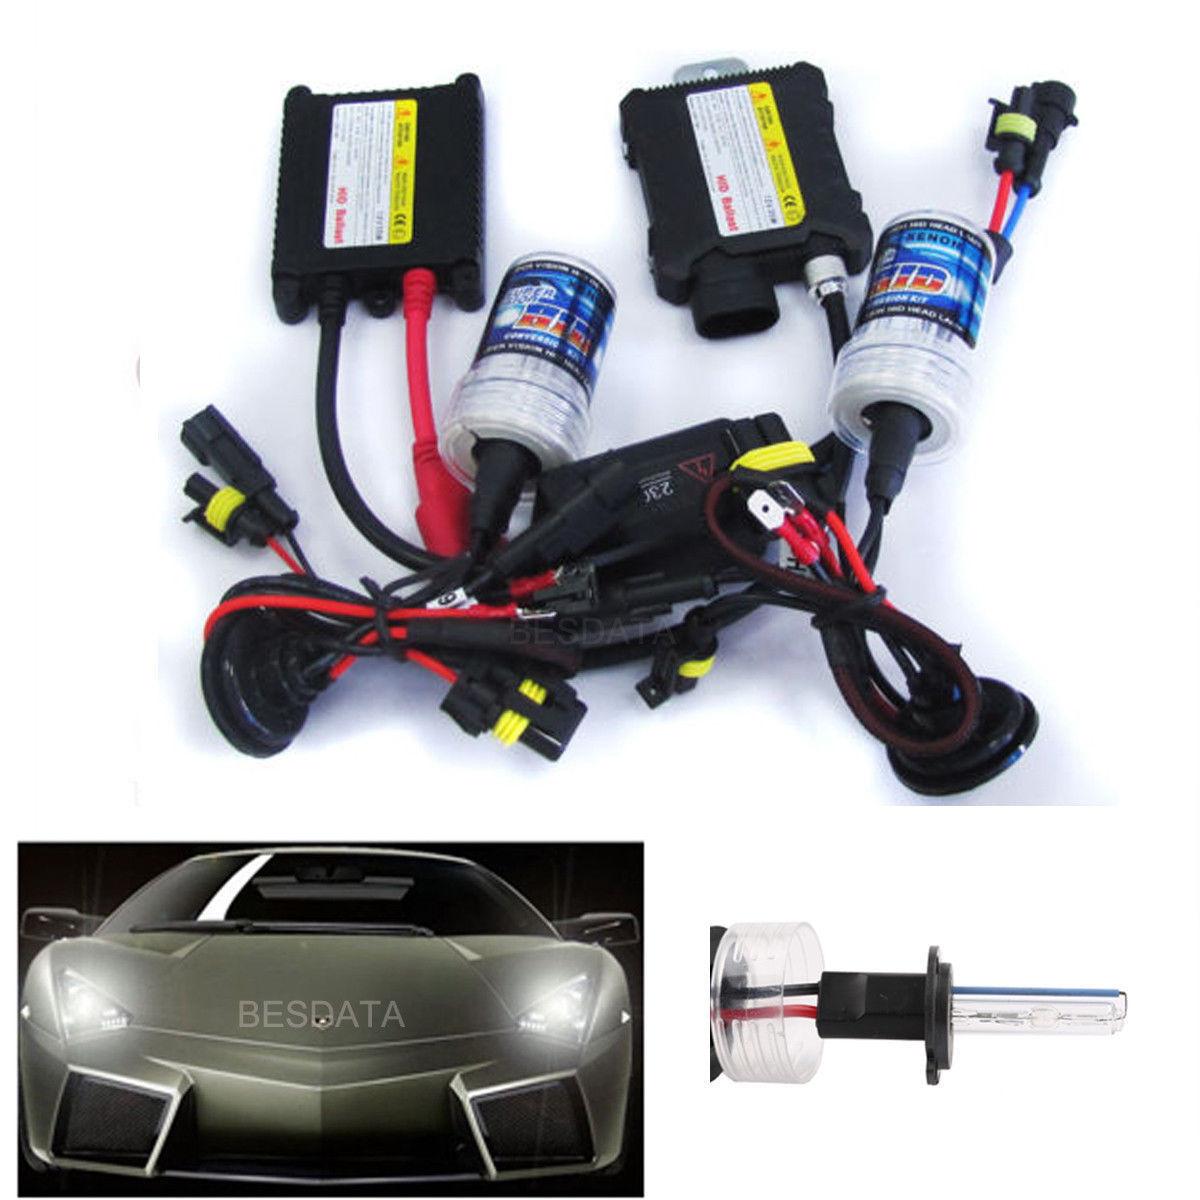 35 55w hid xenon conversion kit headlights slim ballast h1 h4 h7 4300 6000 8000k ebay. Black Bedroom Furniture Sets. Home Design Ideas